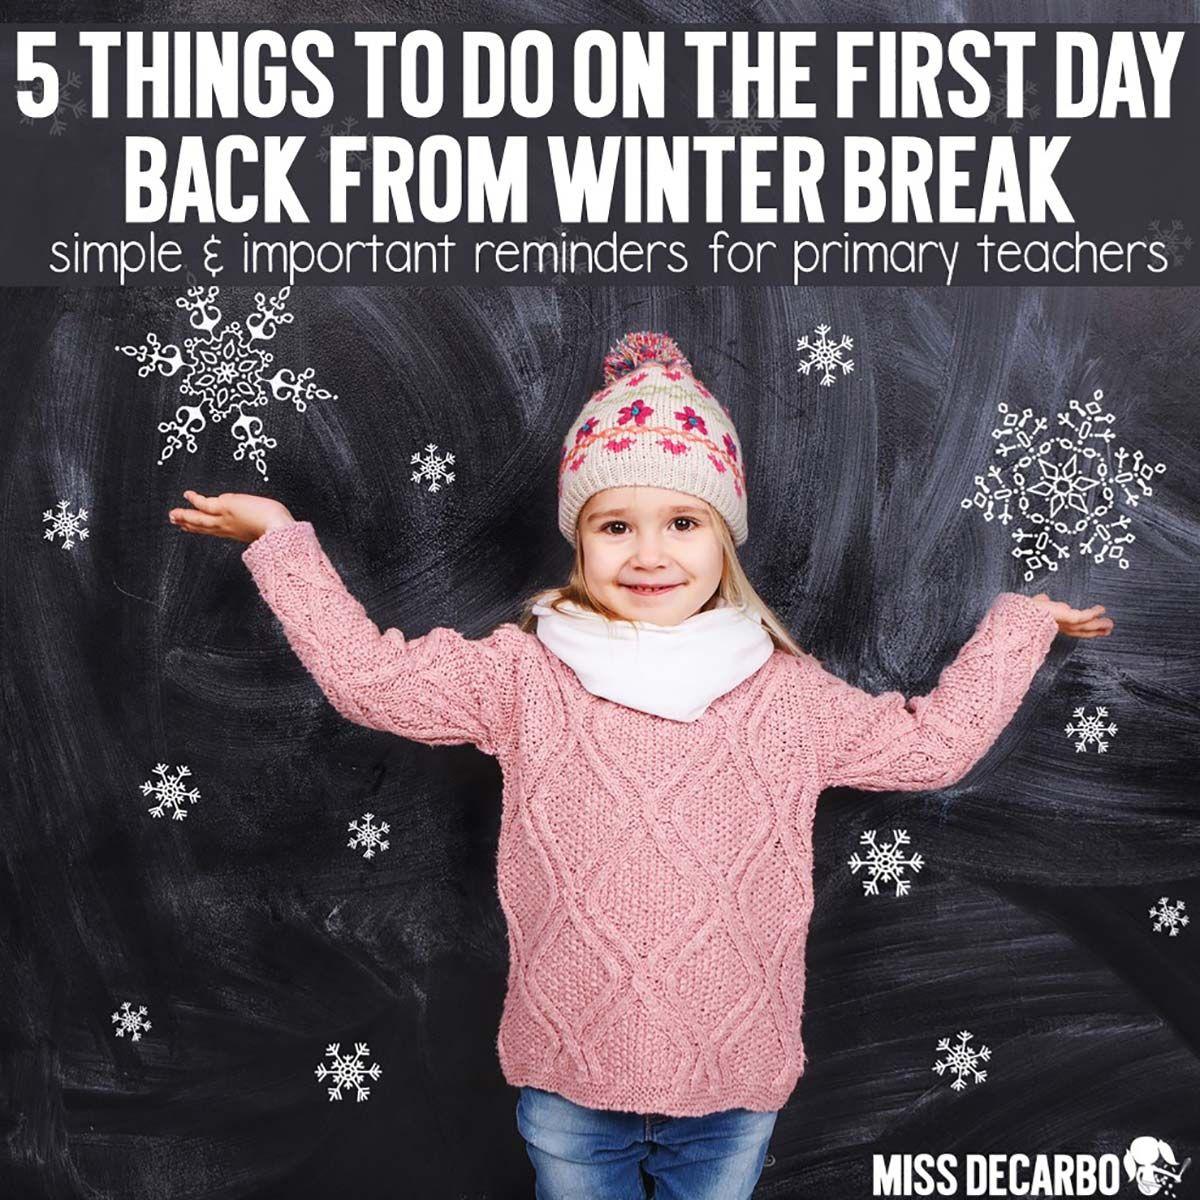 Teacher Tips For The First Day Back From Winter Break